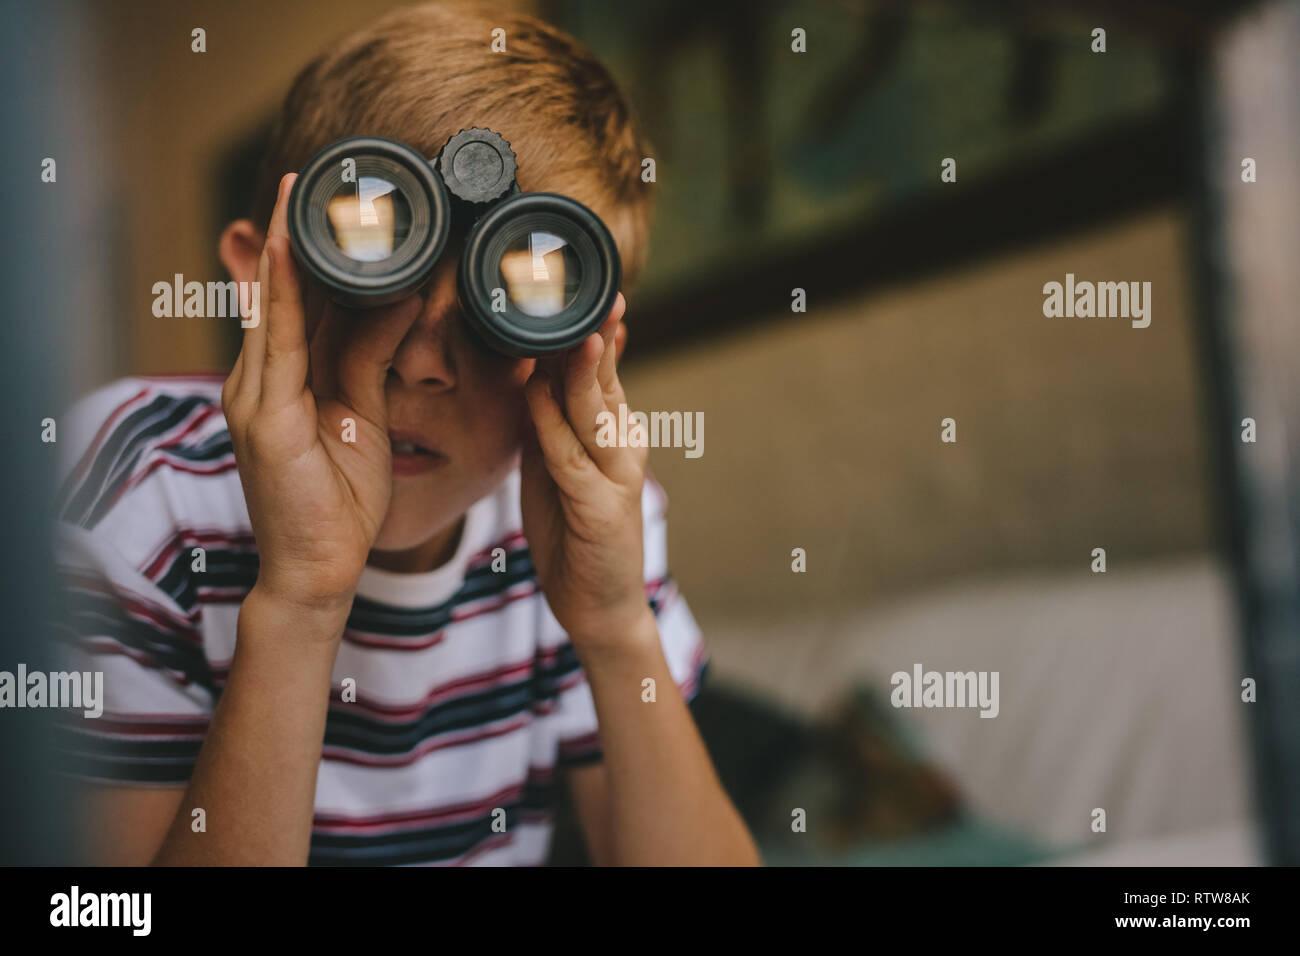 Small boy looking outside window using binoculars. Boy looking through binoculars from the living room. - Stock Image